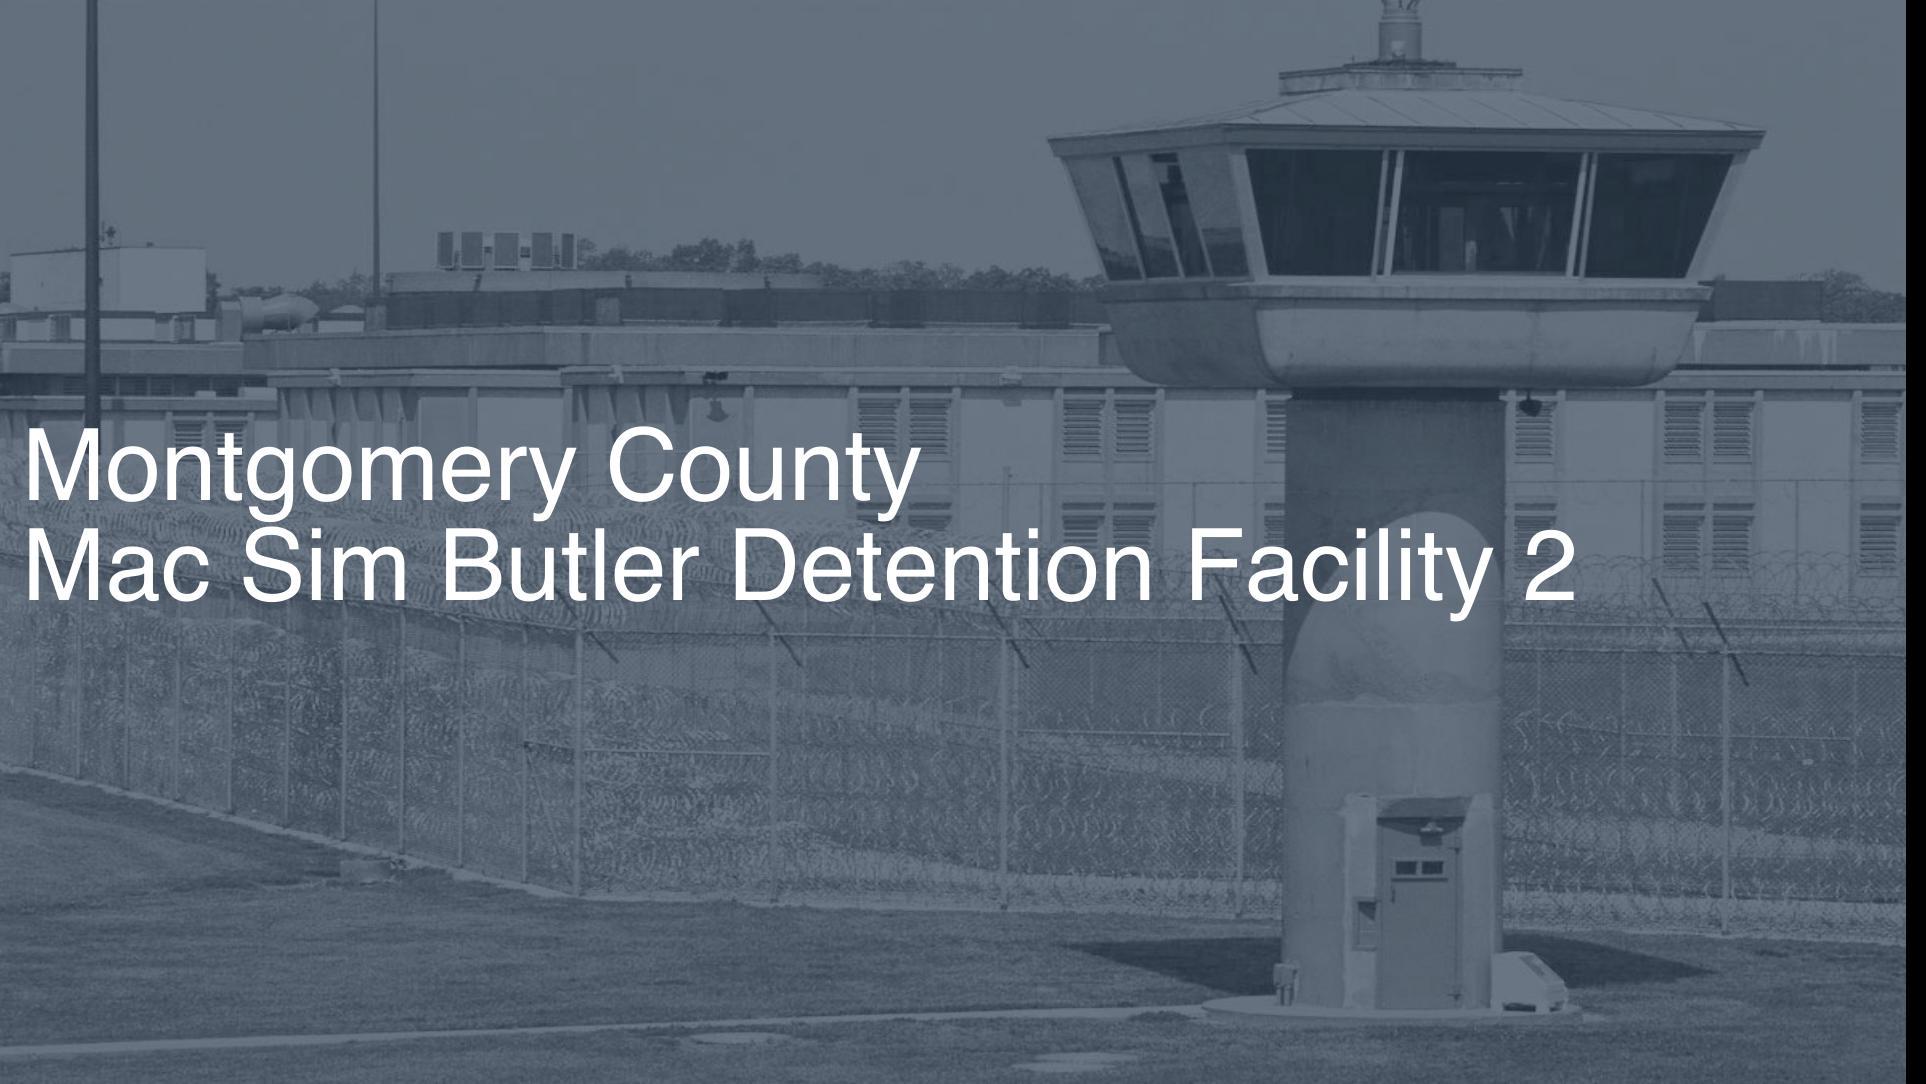 Montgomery County – Mac Sim Butler Detention Facility